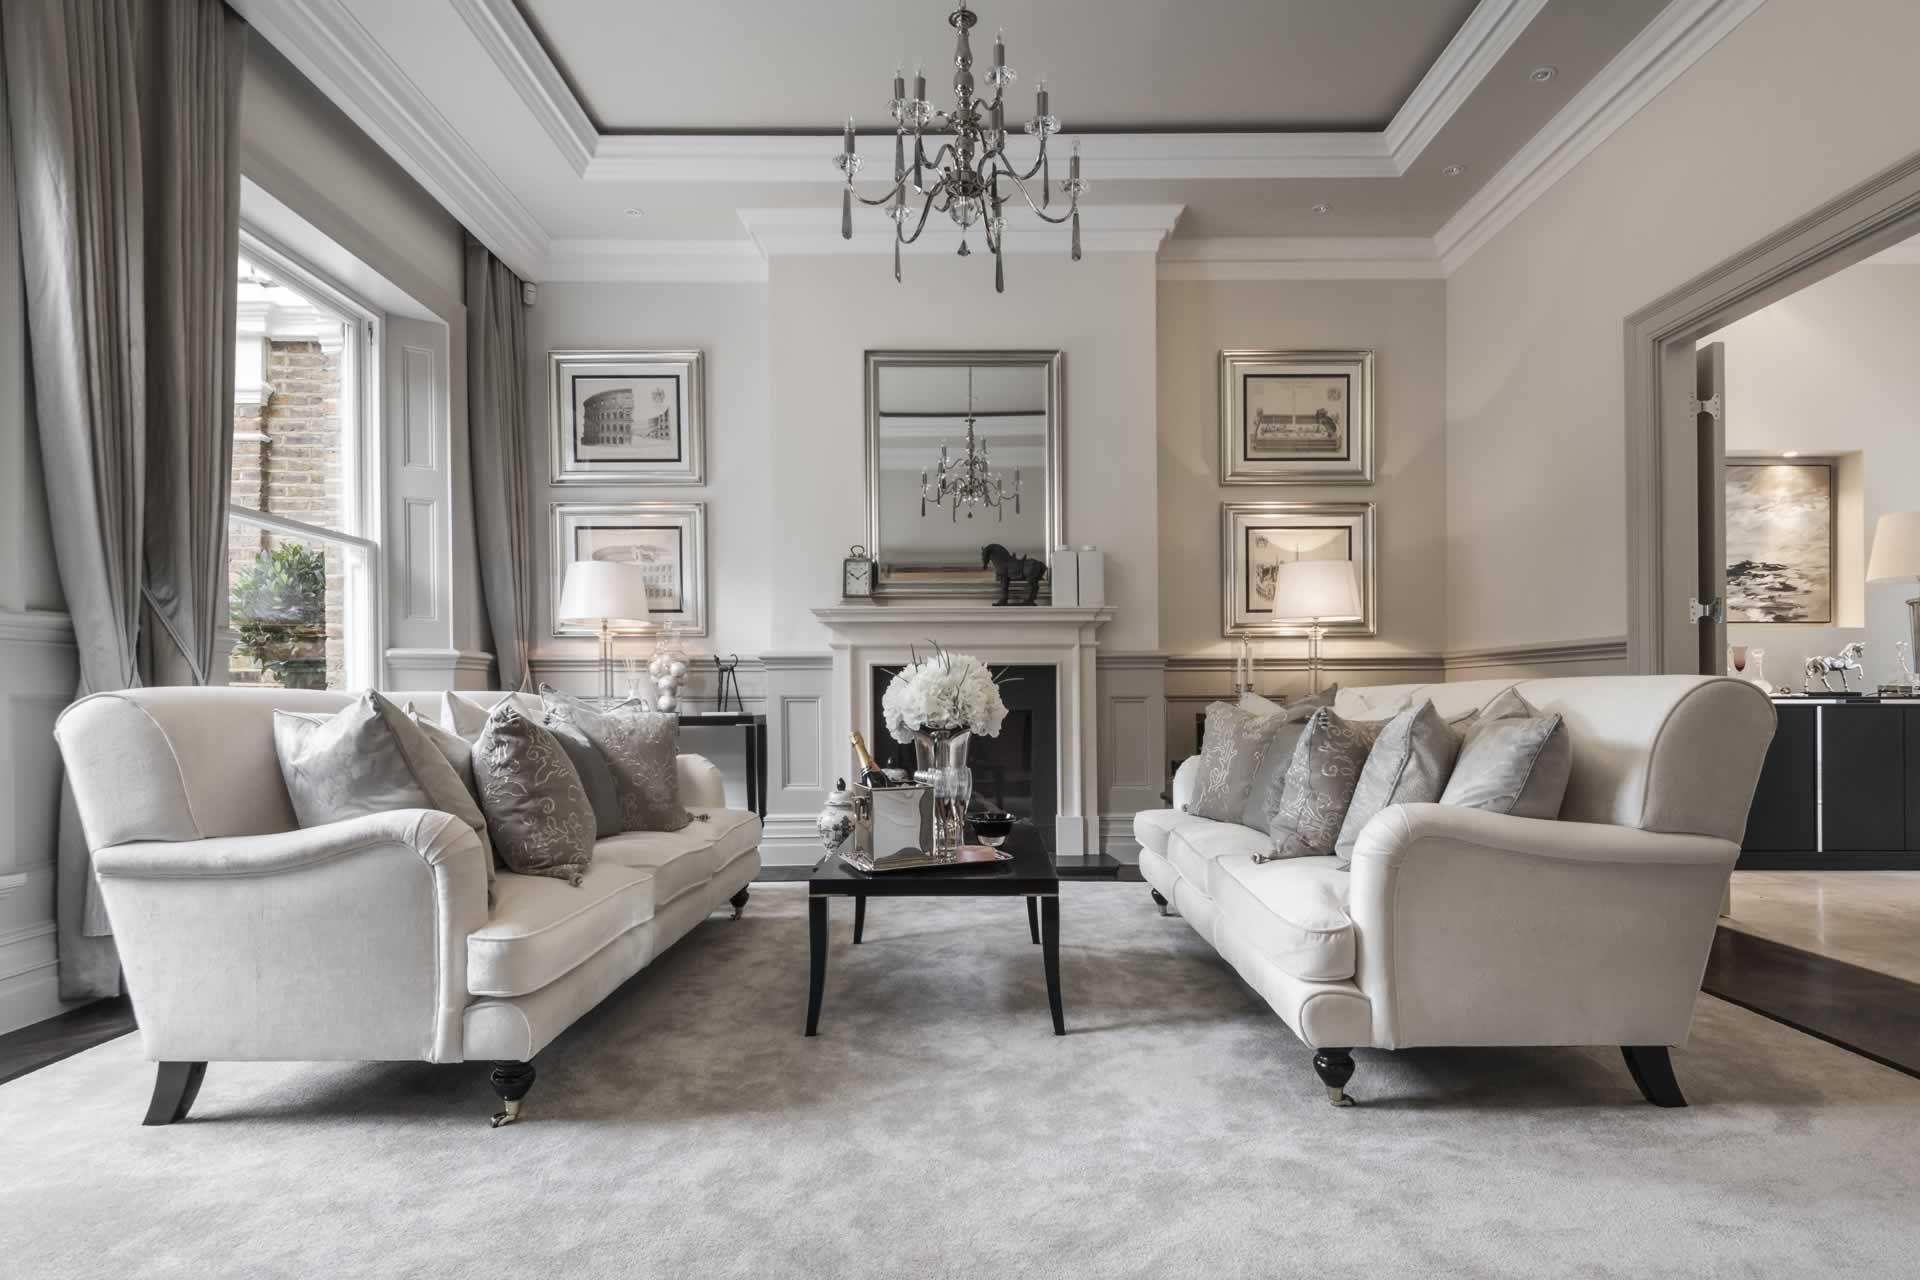 Show homes interior design alexander james interiors also project rh ar pinterest